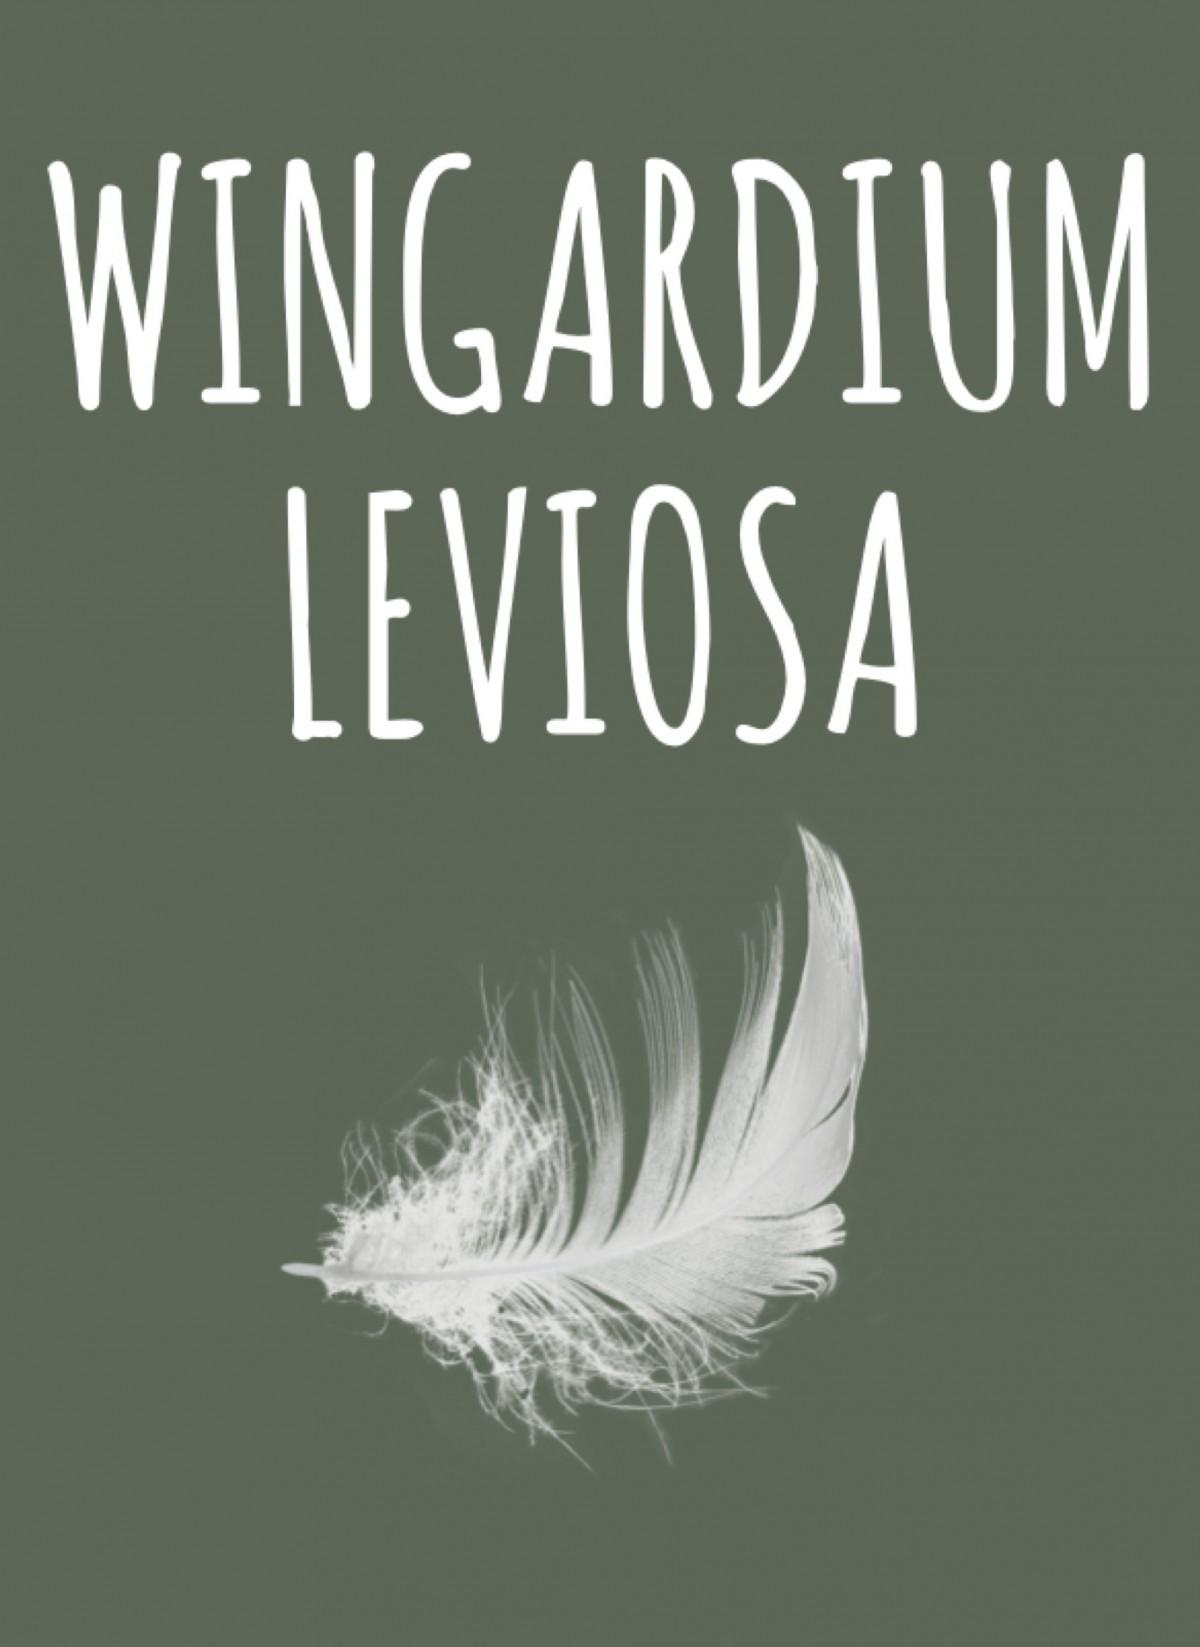 Poster Wingardium leviosa